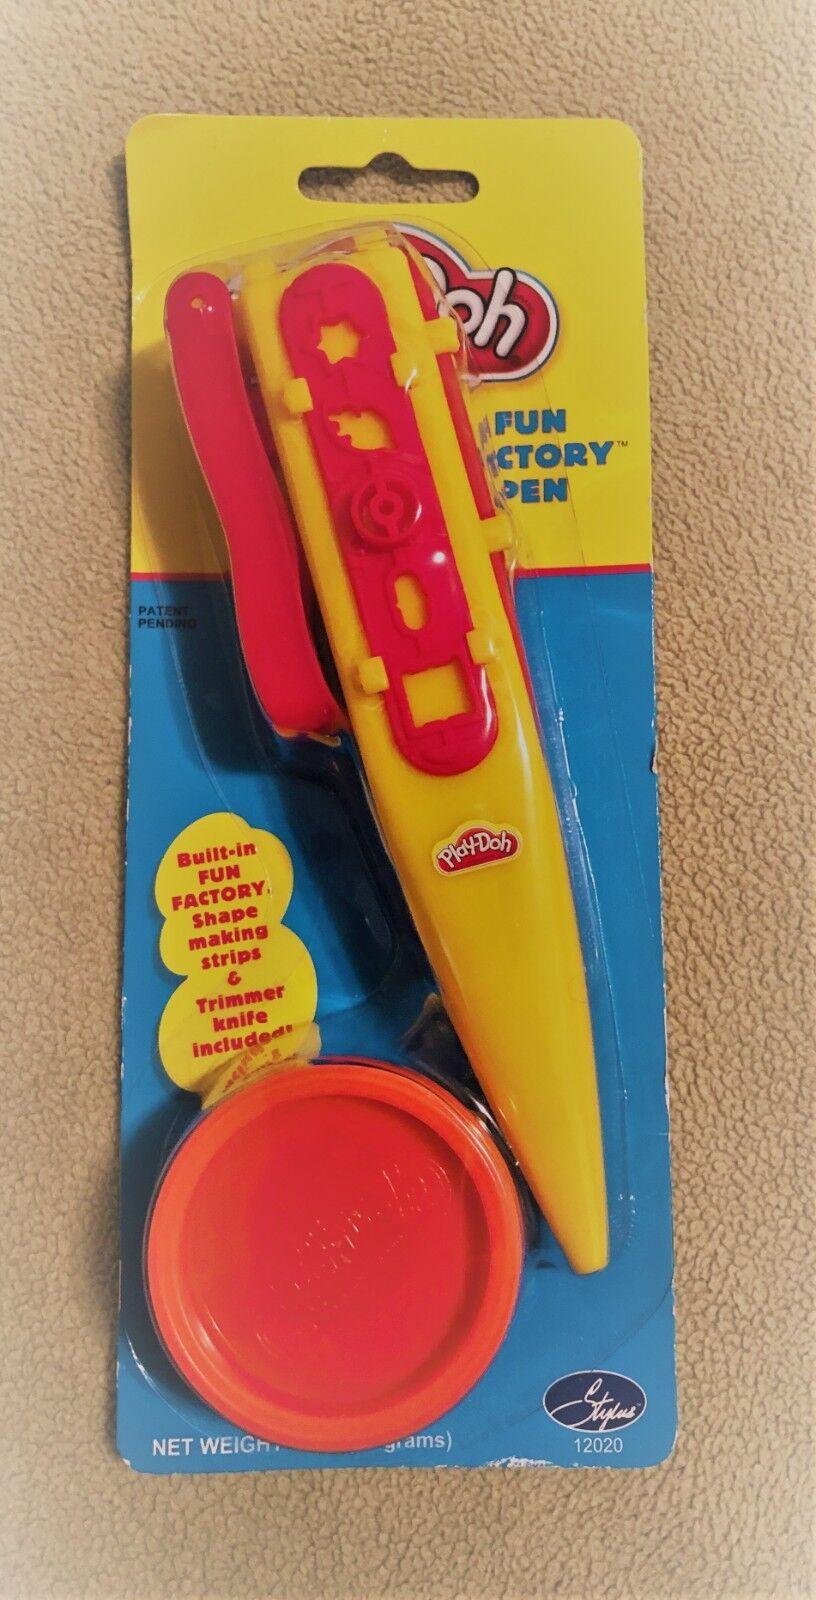 Play-doh Fun Factory Pen Playdoh Shapes Trimmer 2004 Stylus Hasbro